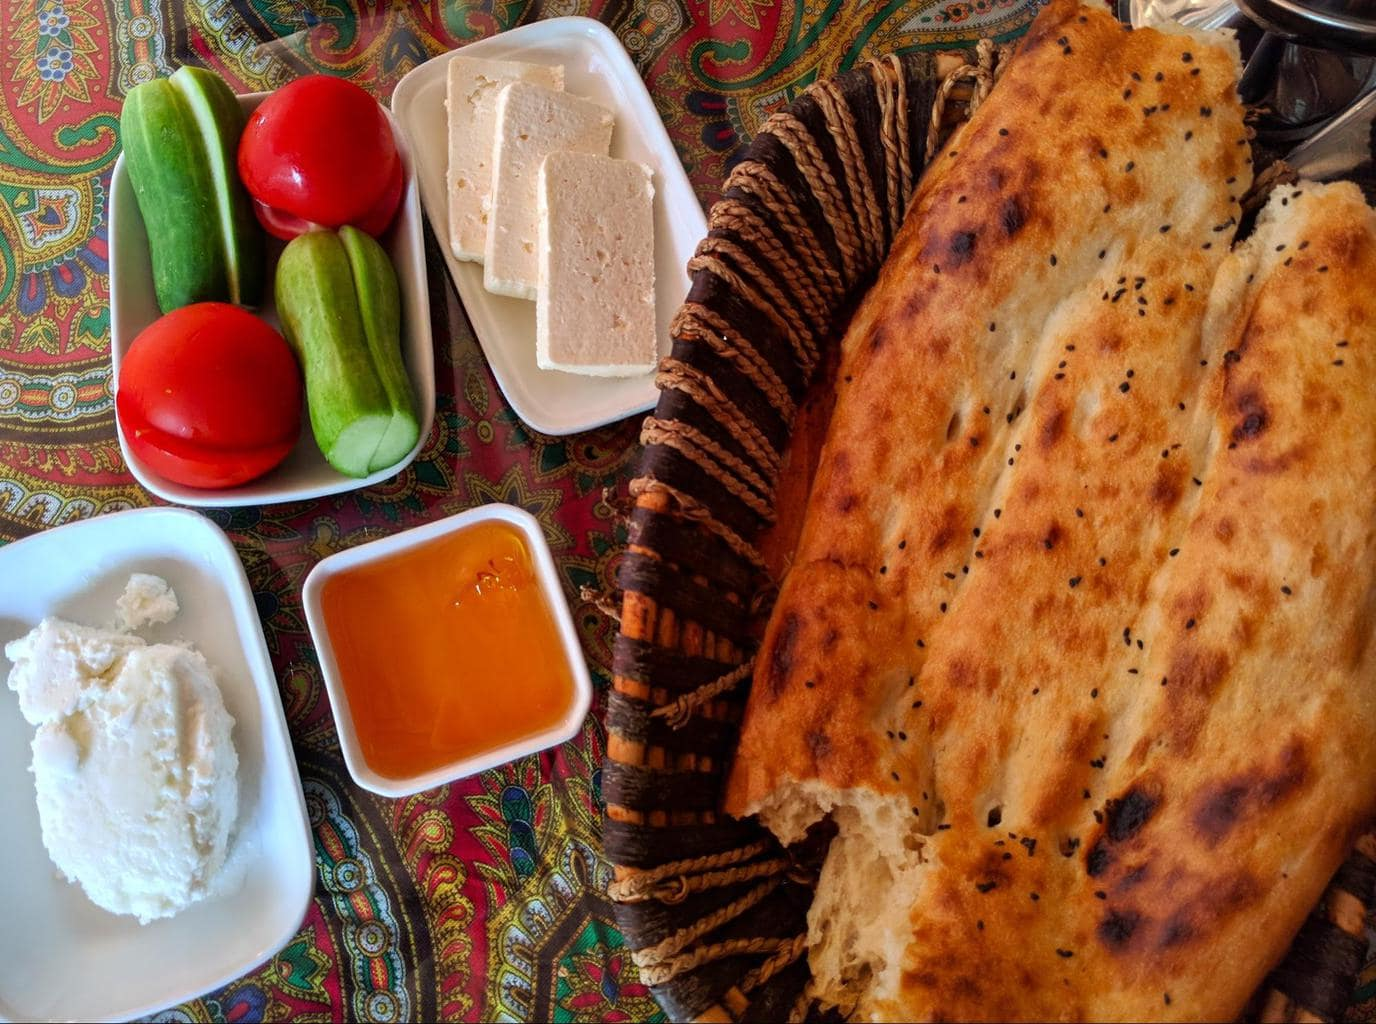 Typical Azerbaijan breakfast